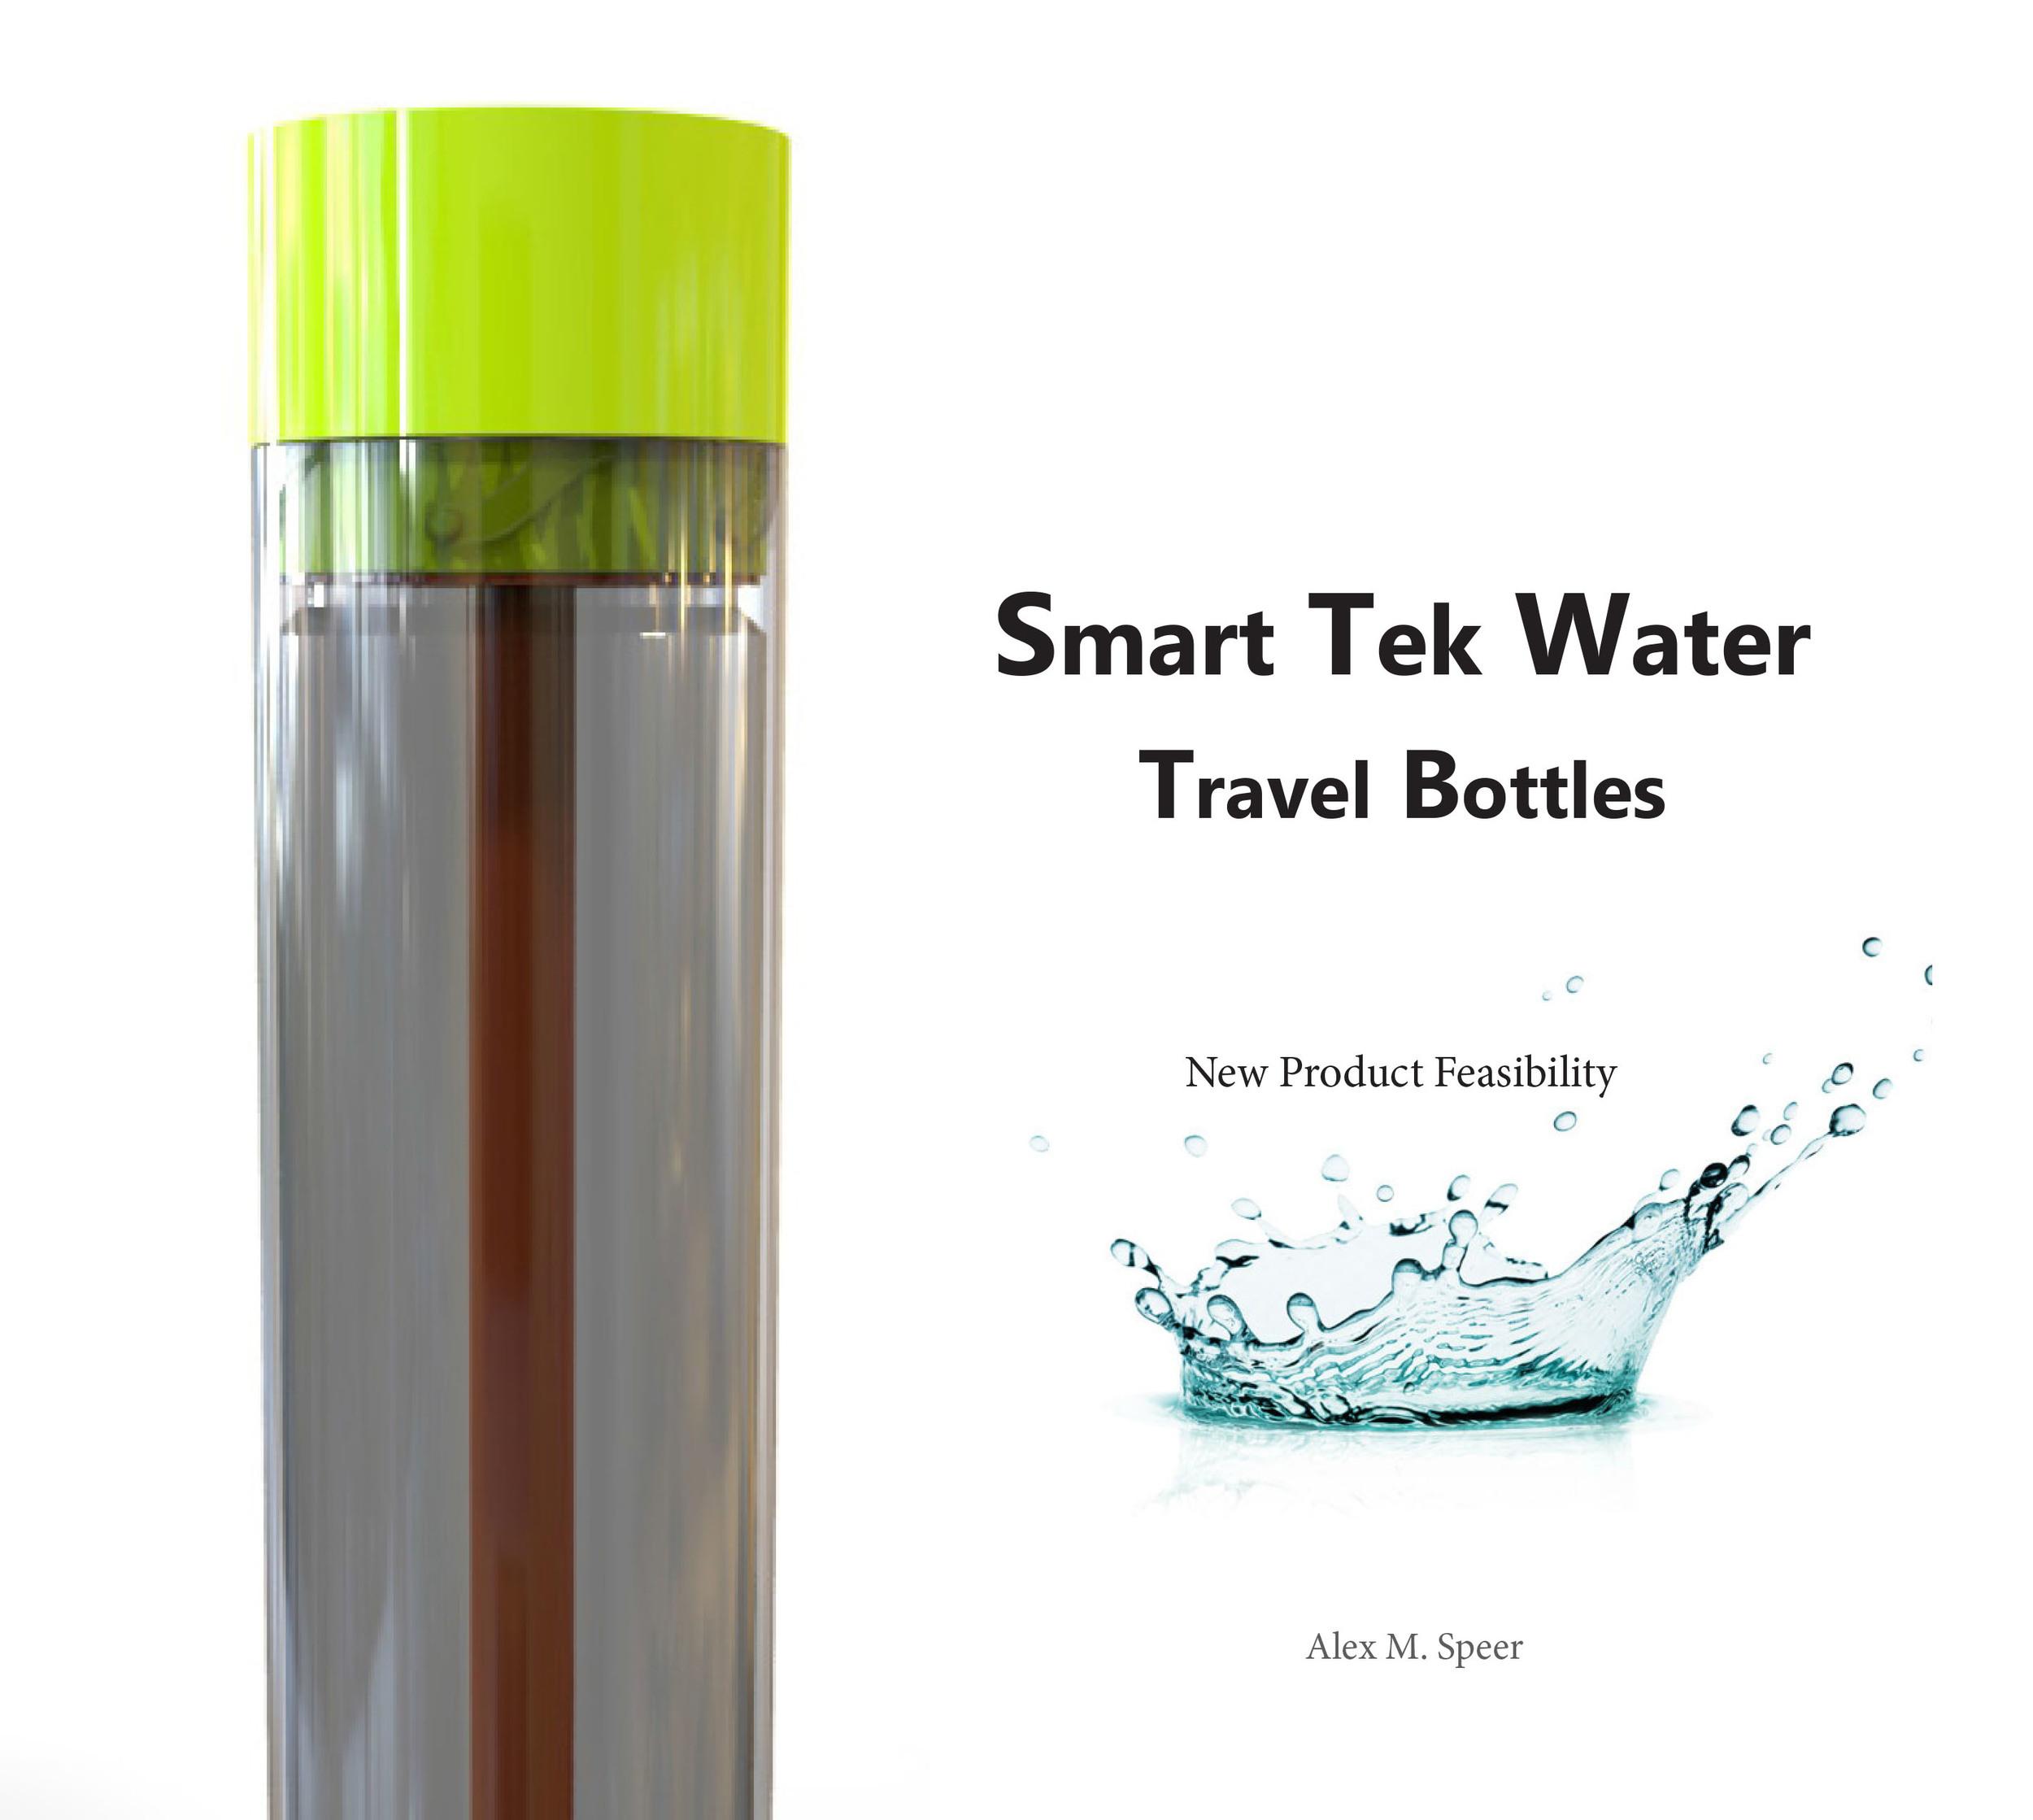 water bottle fesibility Alex M Speer-1.jpg